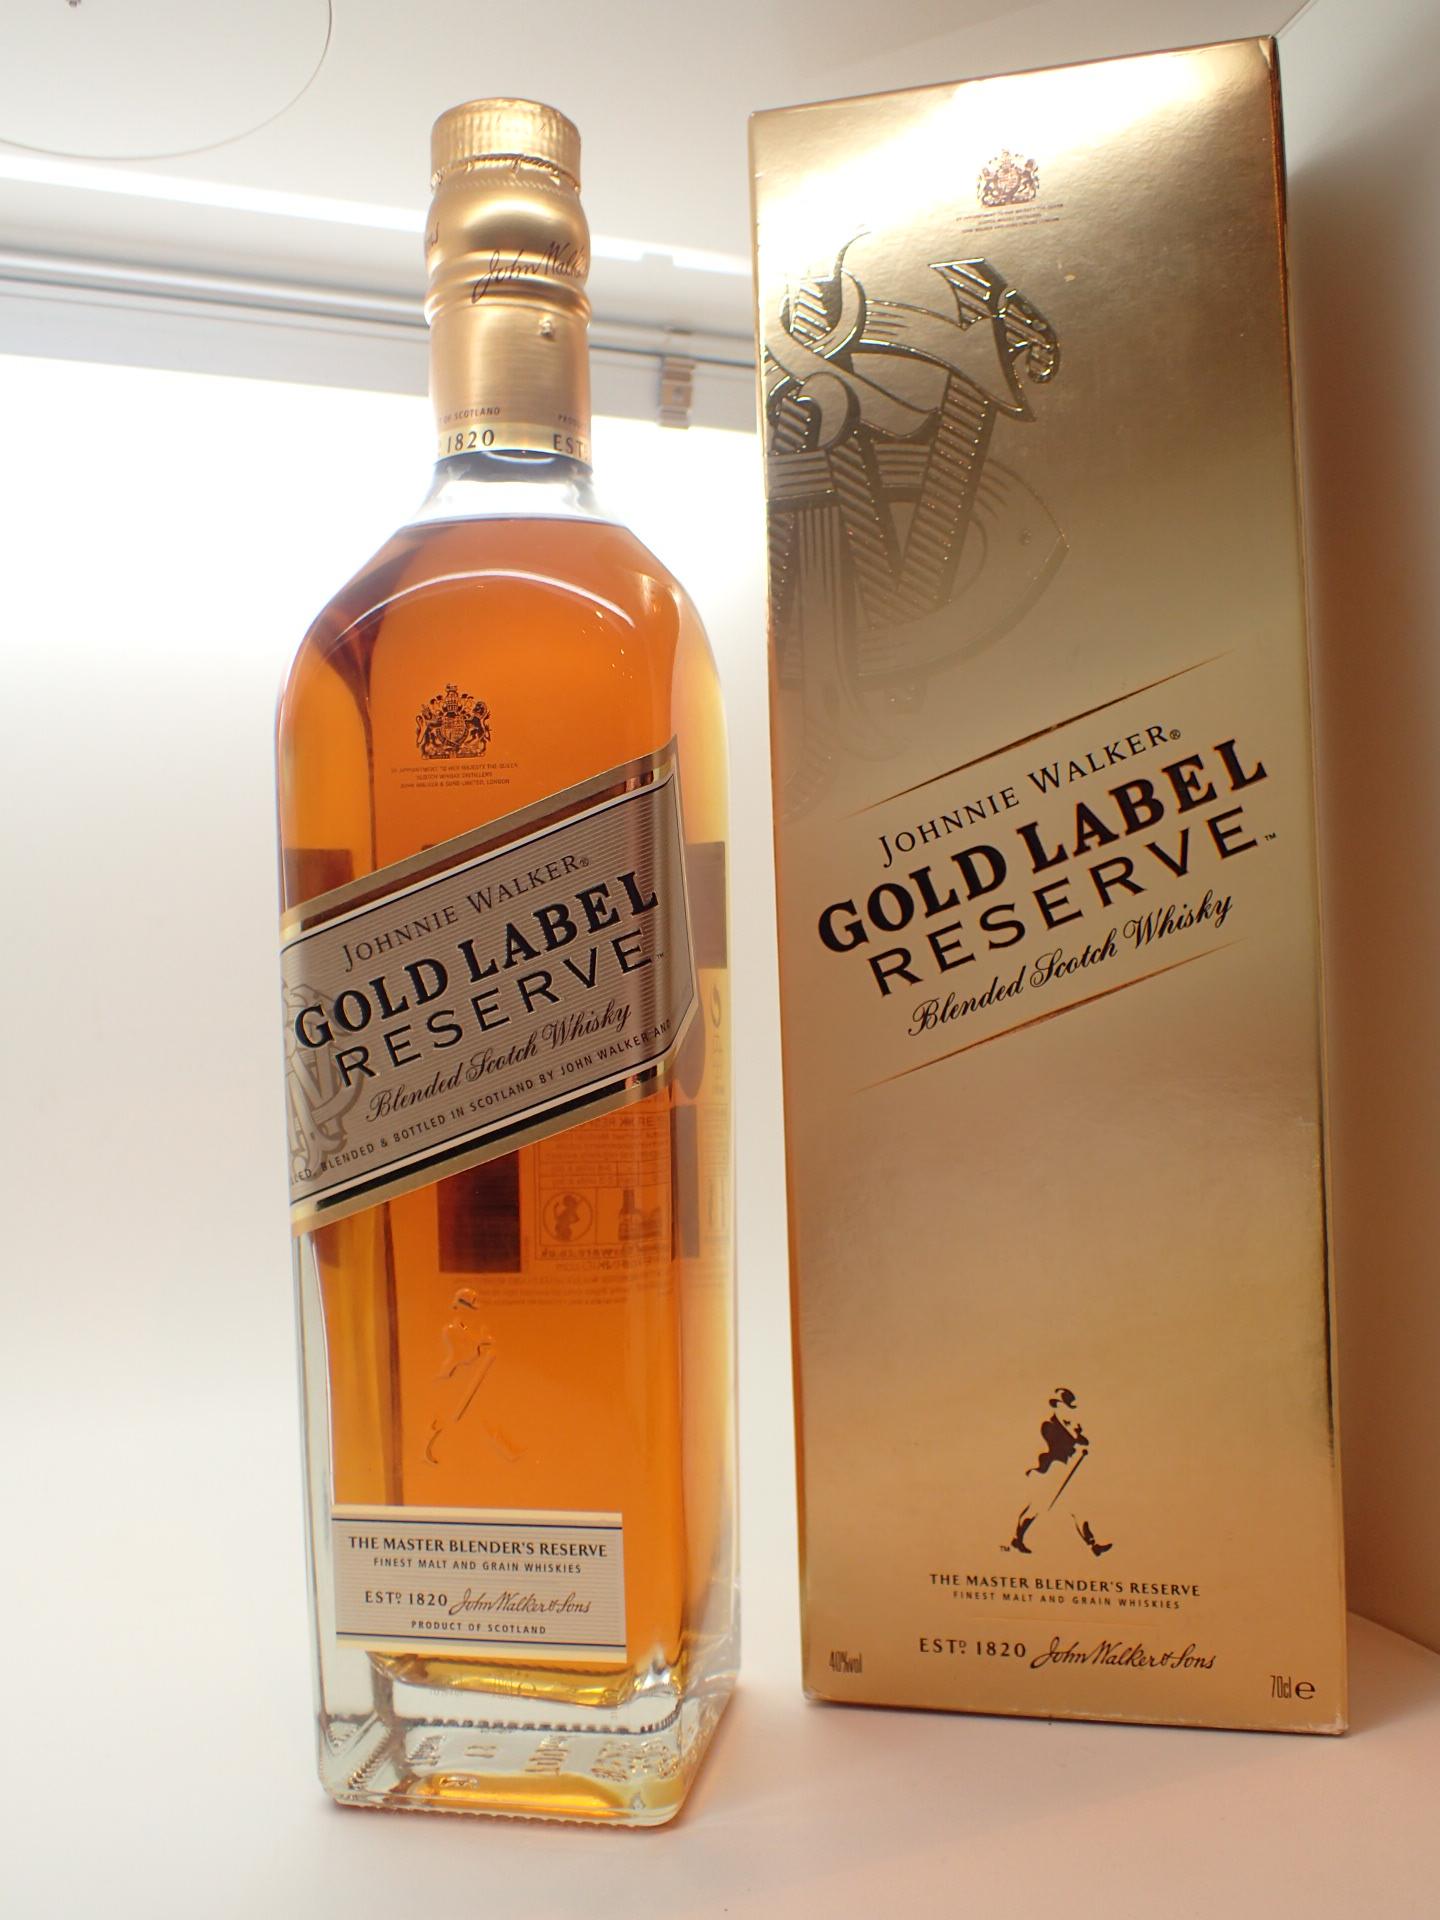 Lot 508 - Johnnie Walker Gold Label Reserve Scotch